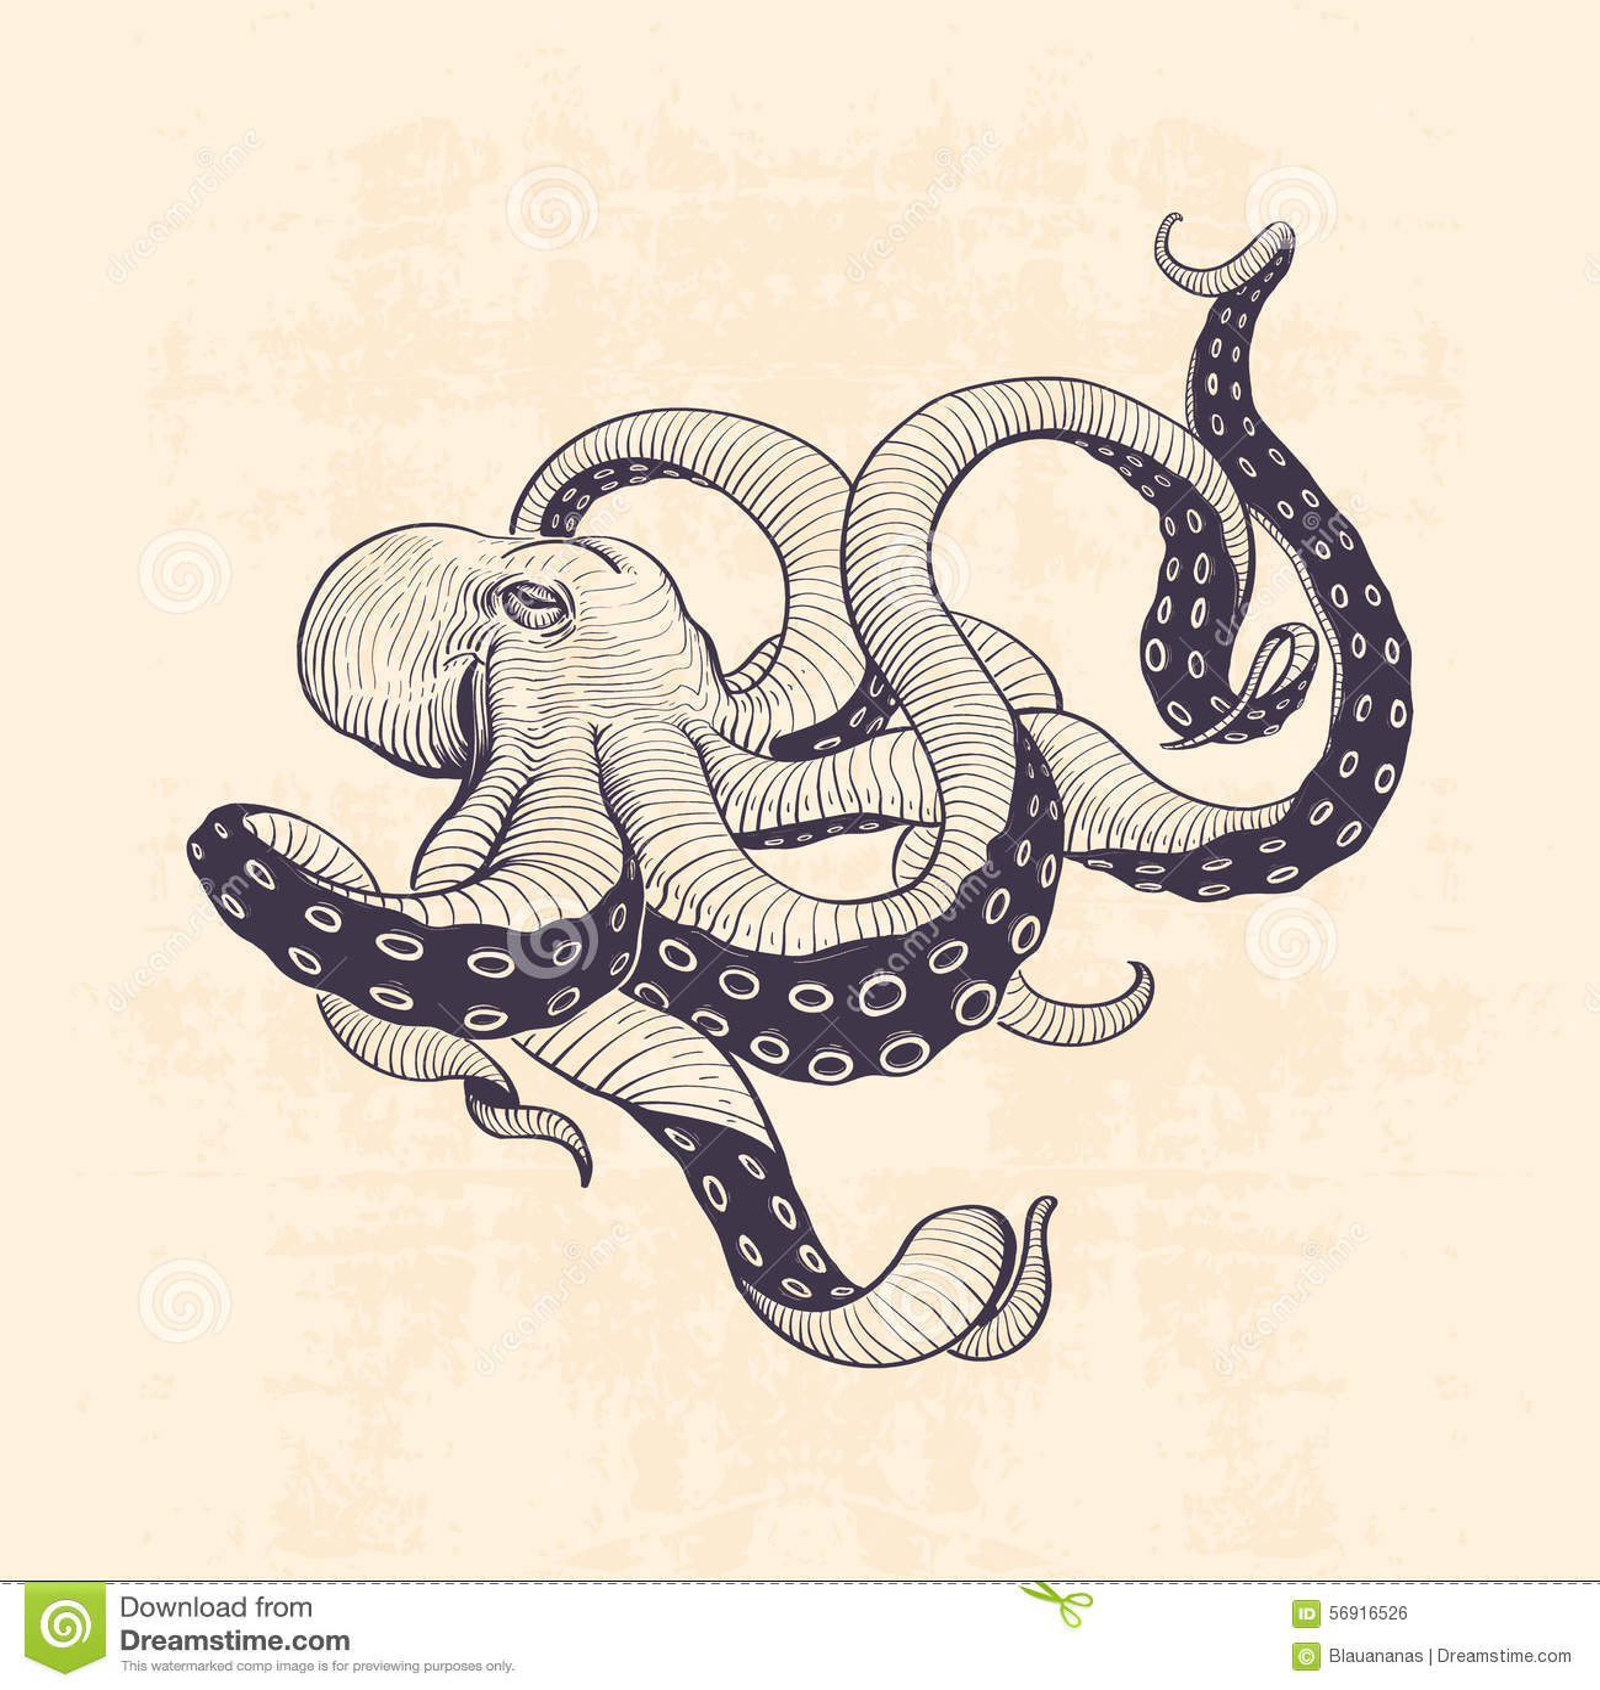 Octopus vintage stock vector. Illustration of illustration ...